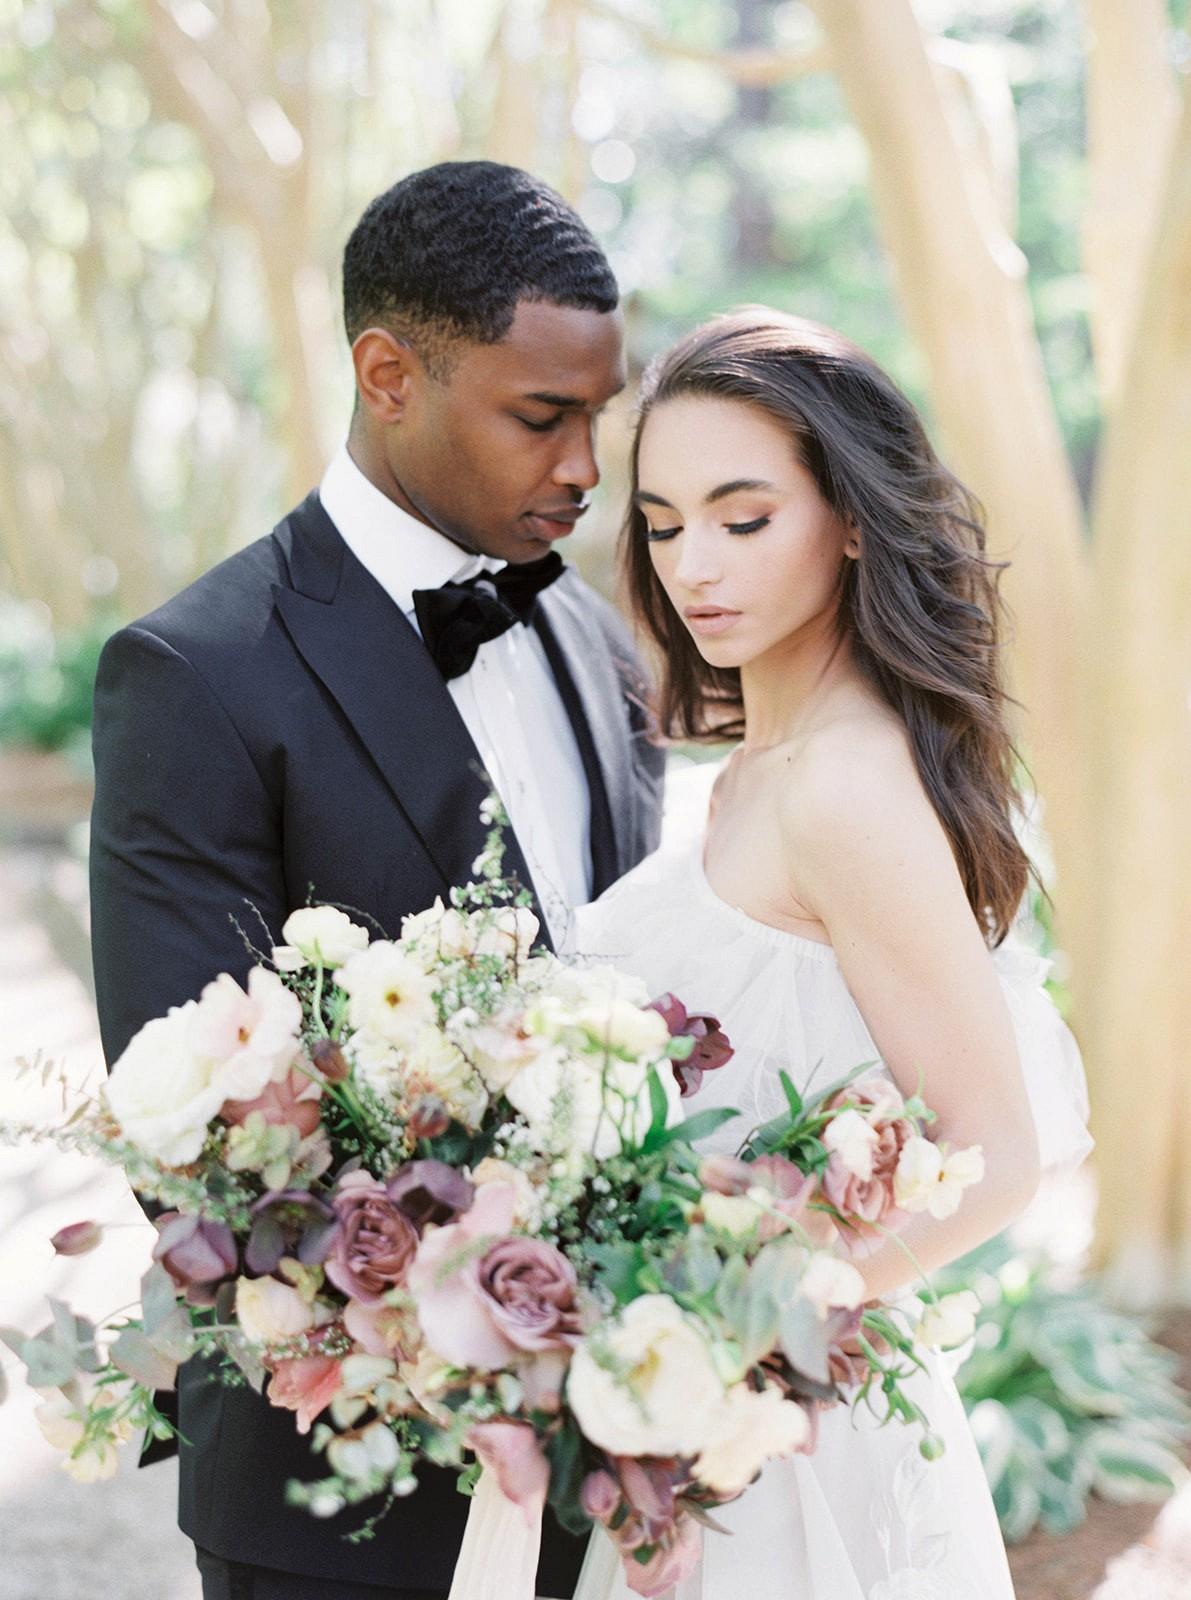 Botanical Wedding Style at the Swan House